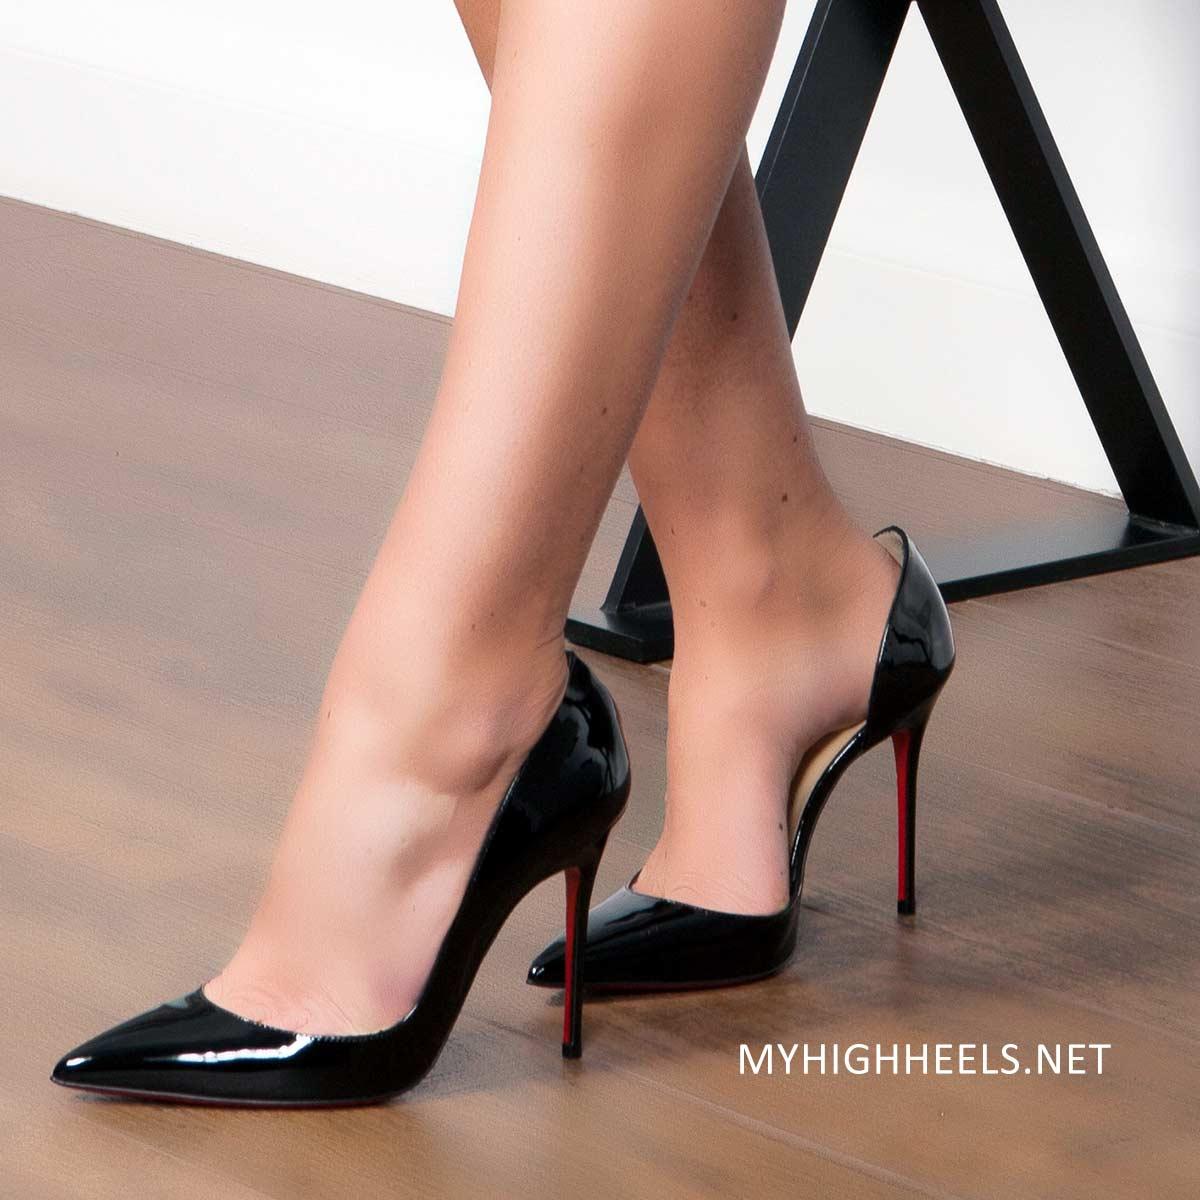 2a8832dc061c High heels twitter jpg 1200x1200 Cfm stiletto heels